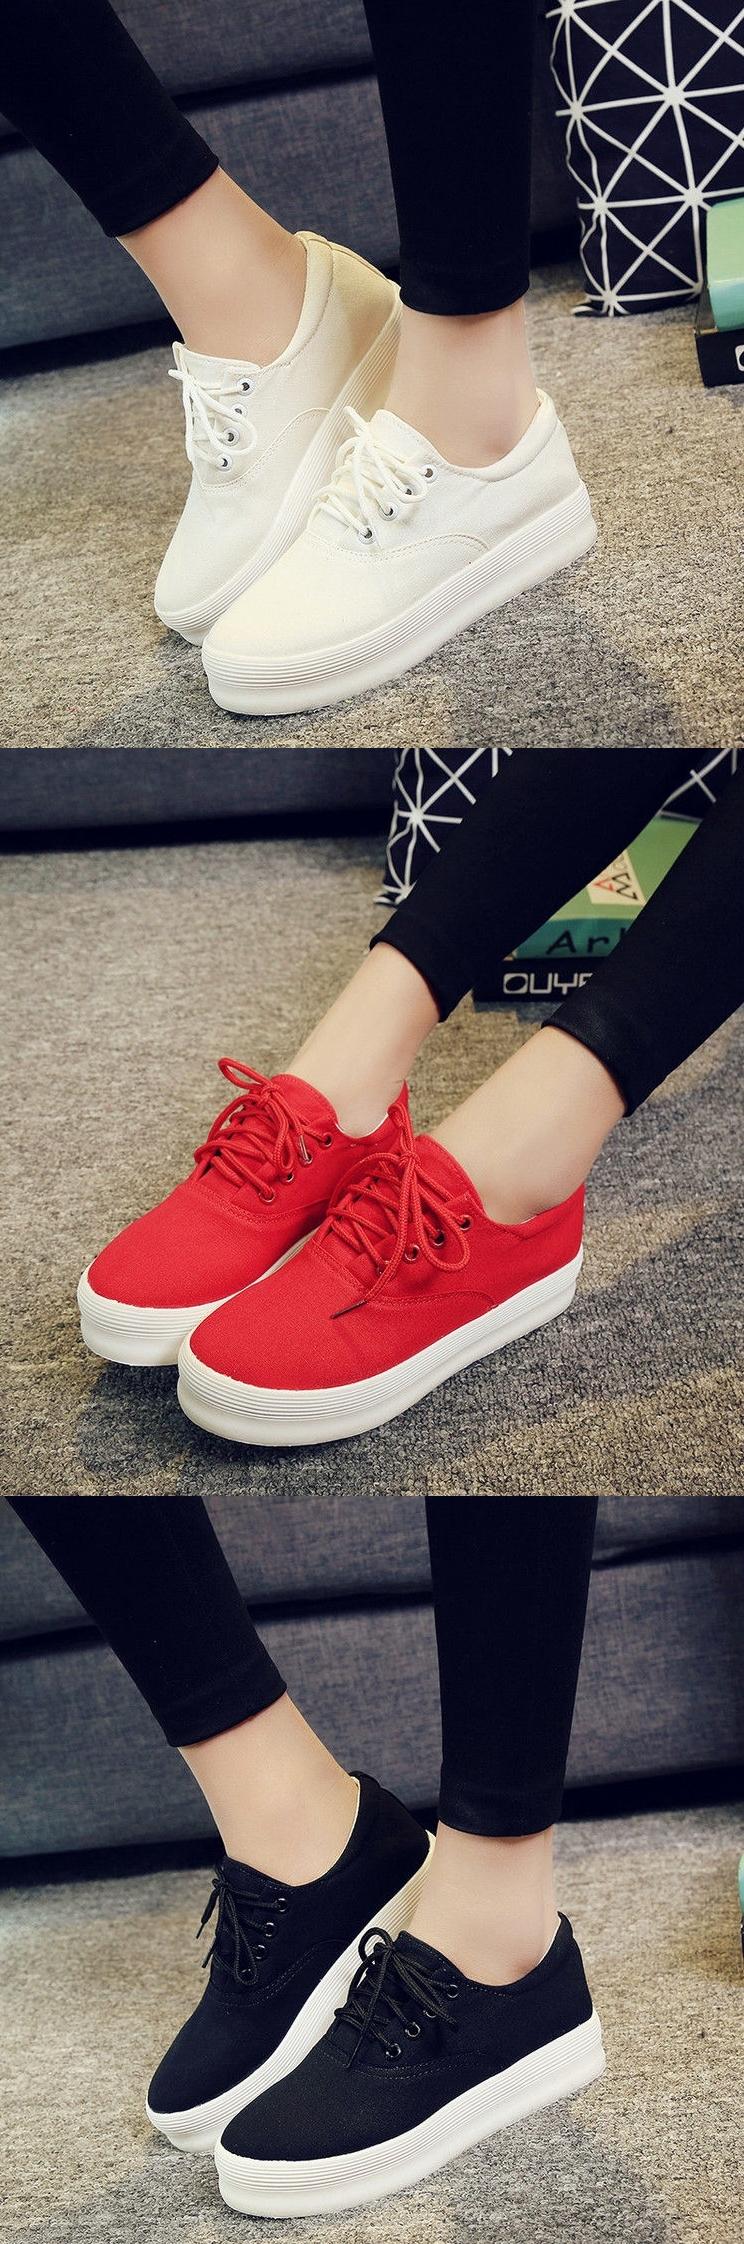 80e53d18634 Sunsteps - Platform Sneakers Platform Sneakers